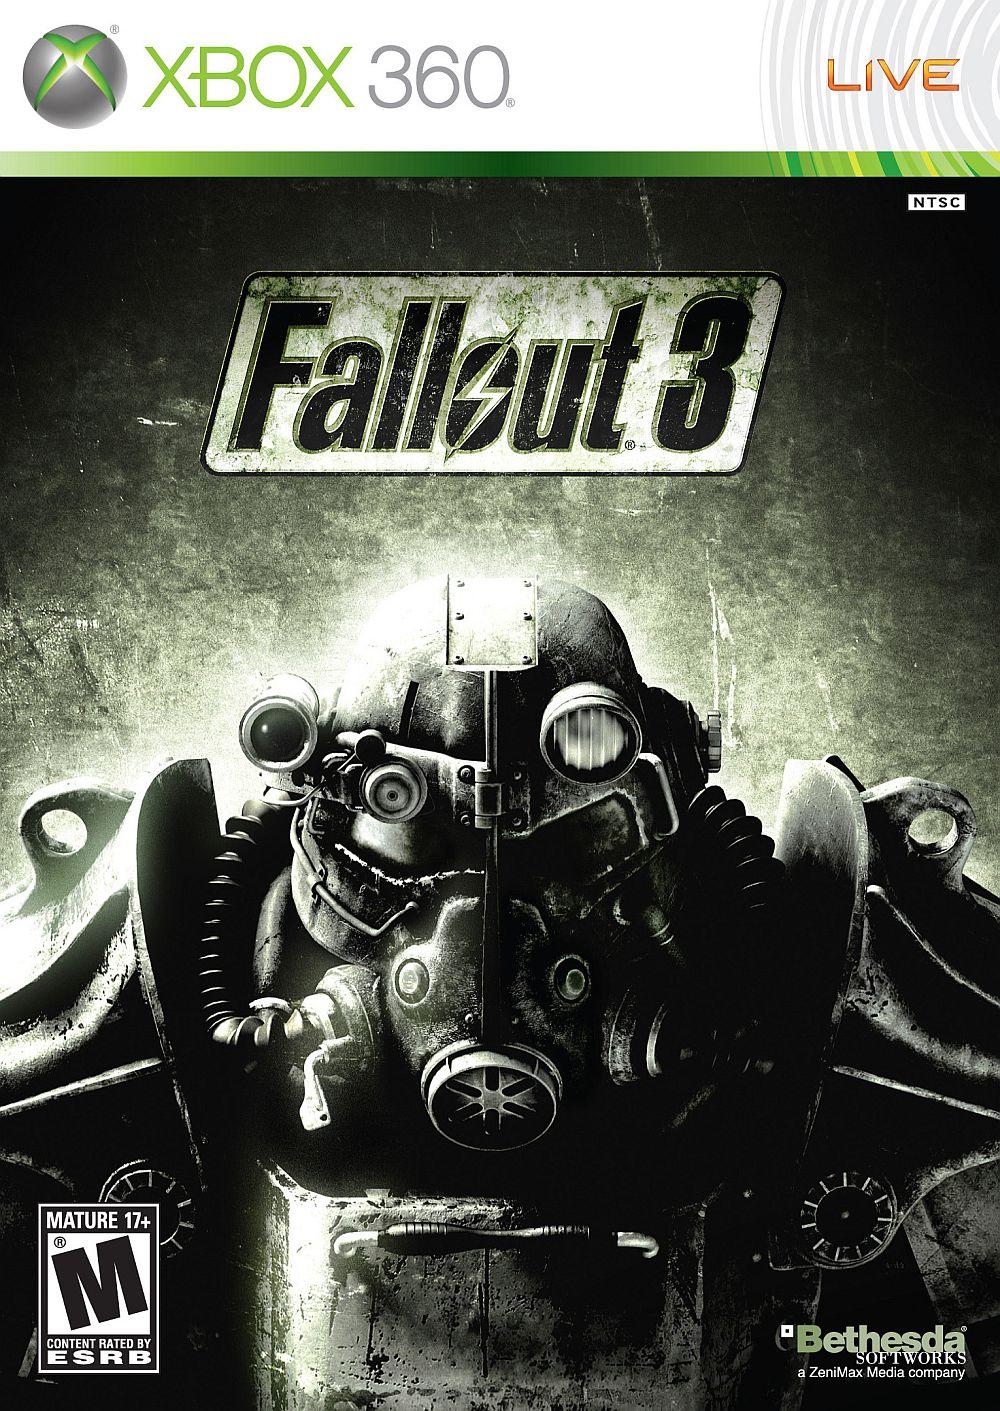 [CDkeys] Fallout 3  - Xbox 360 - Digital Code - VGP mit Versand : 19,95 €